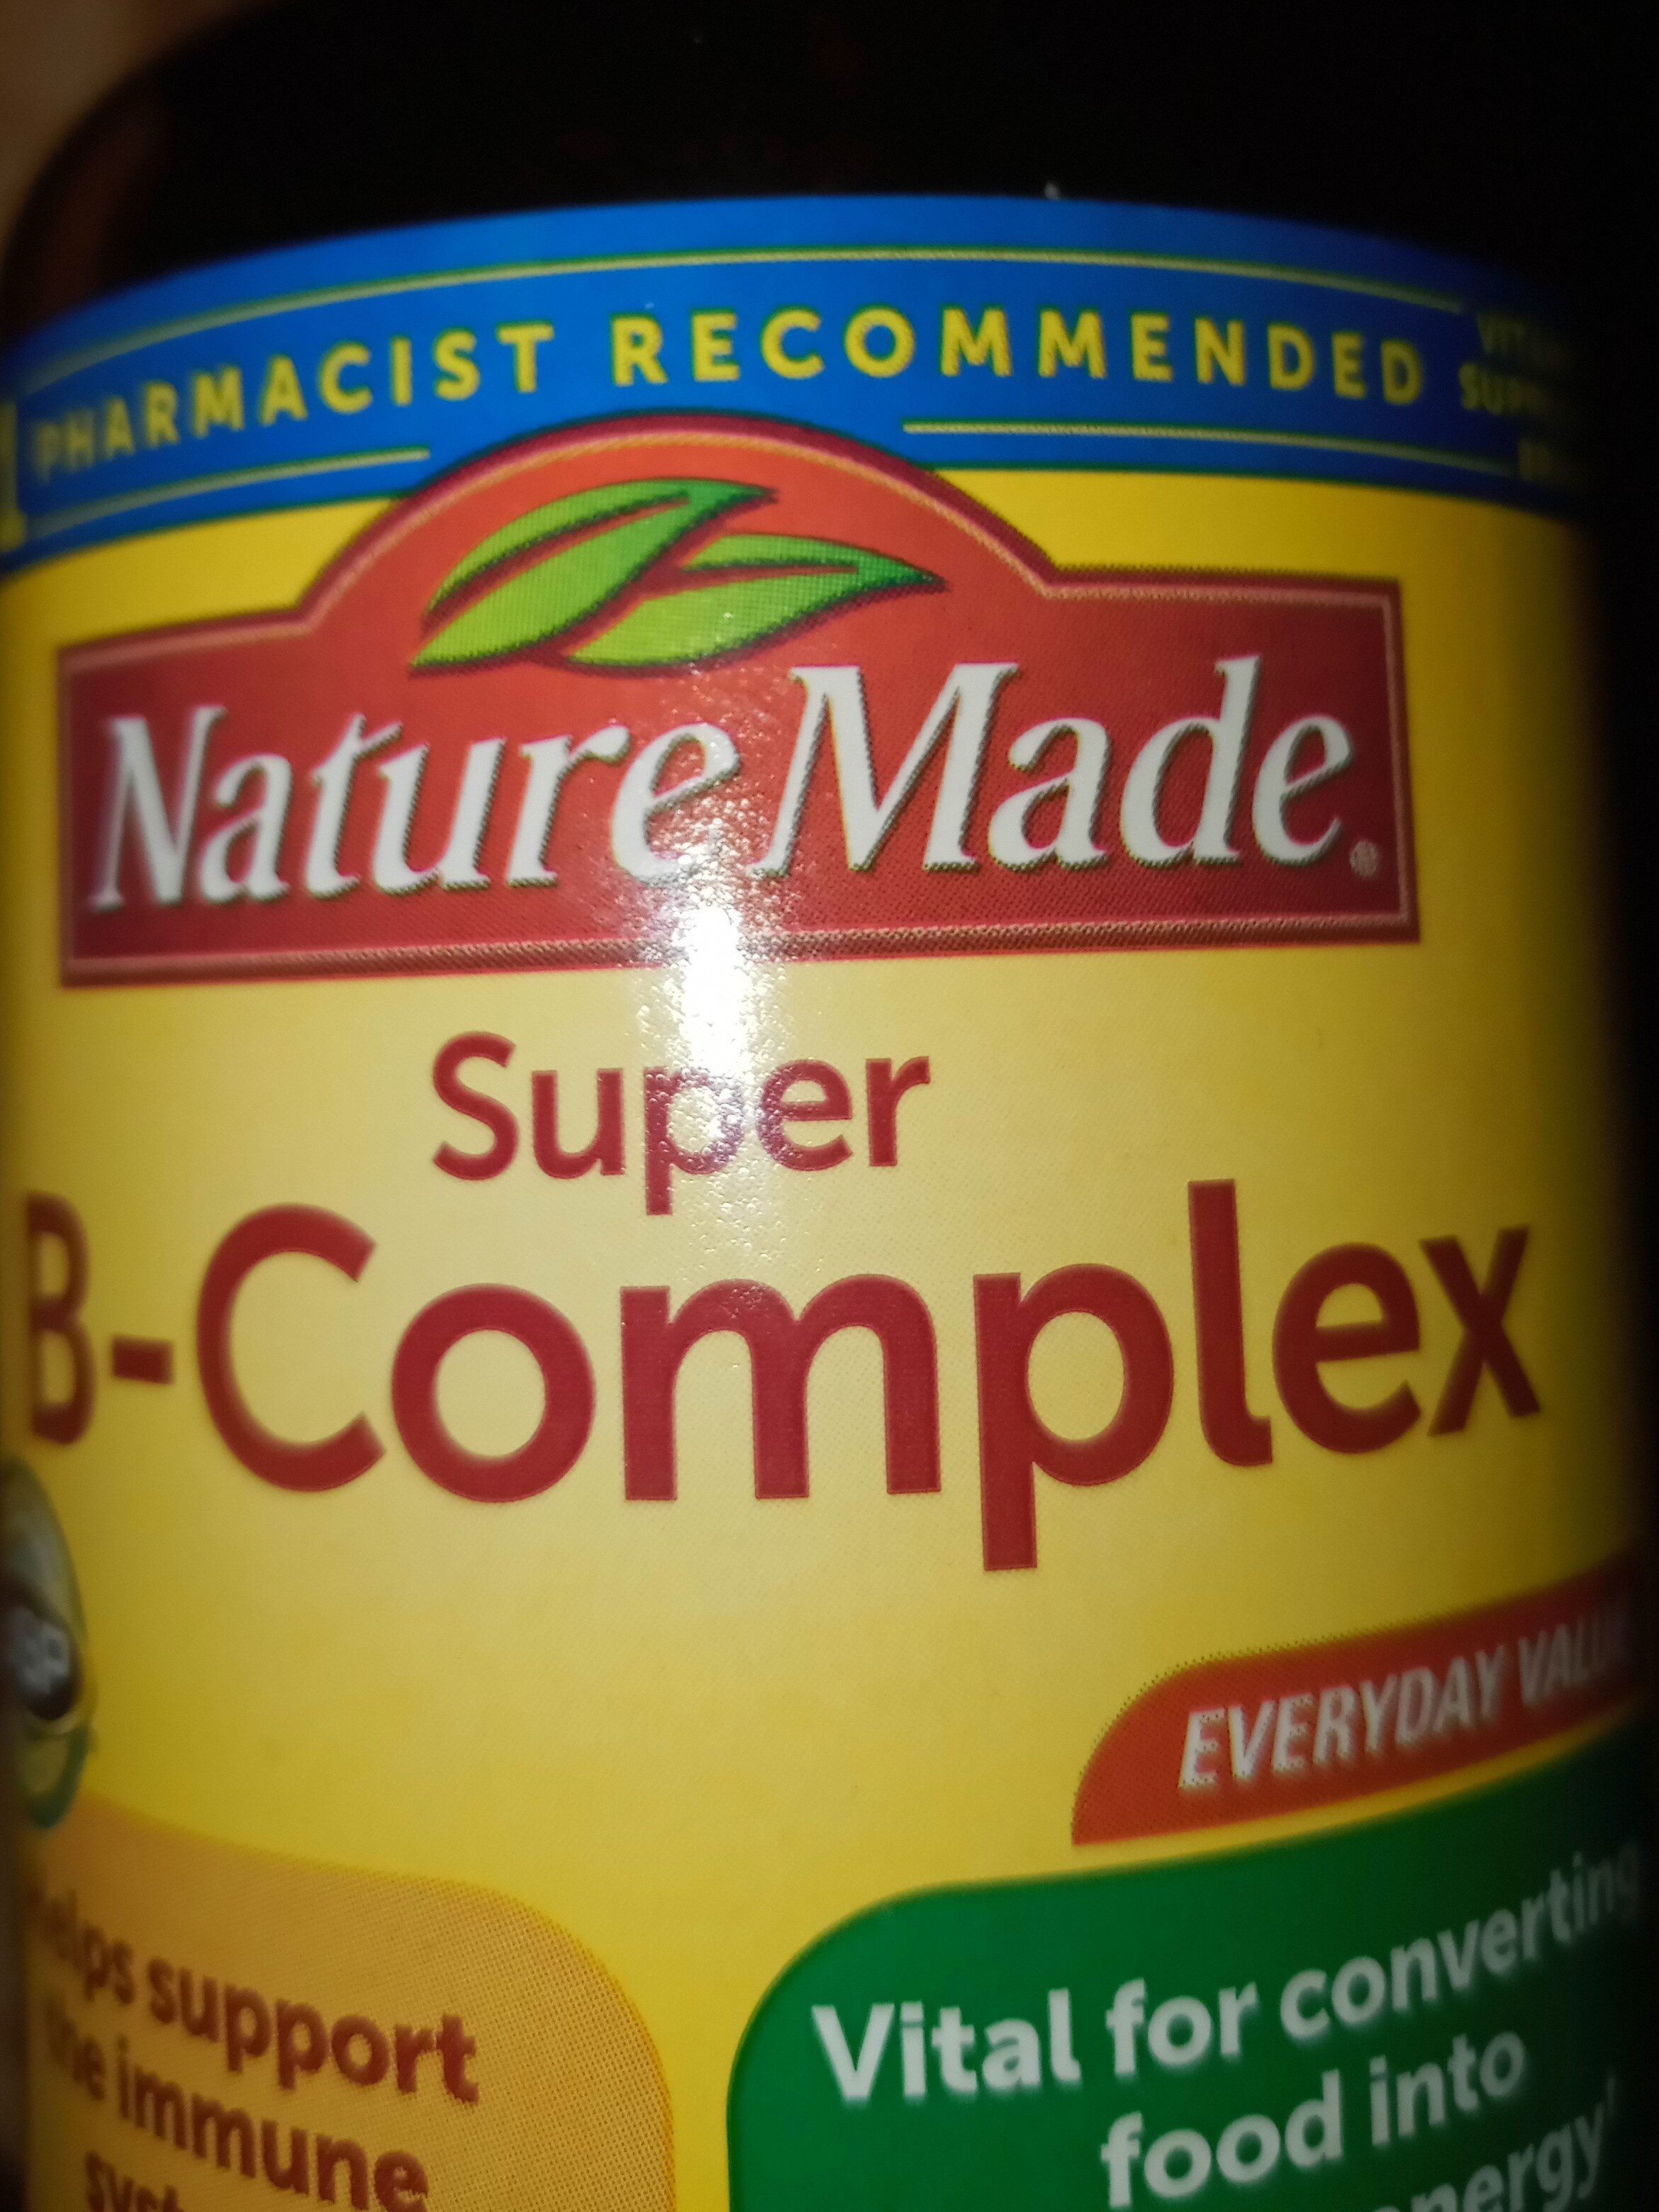 Nature Made Super B-Complex - 成分 - en